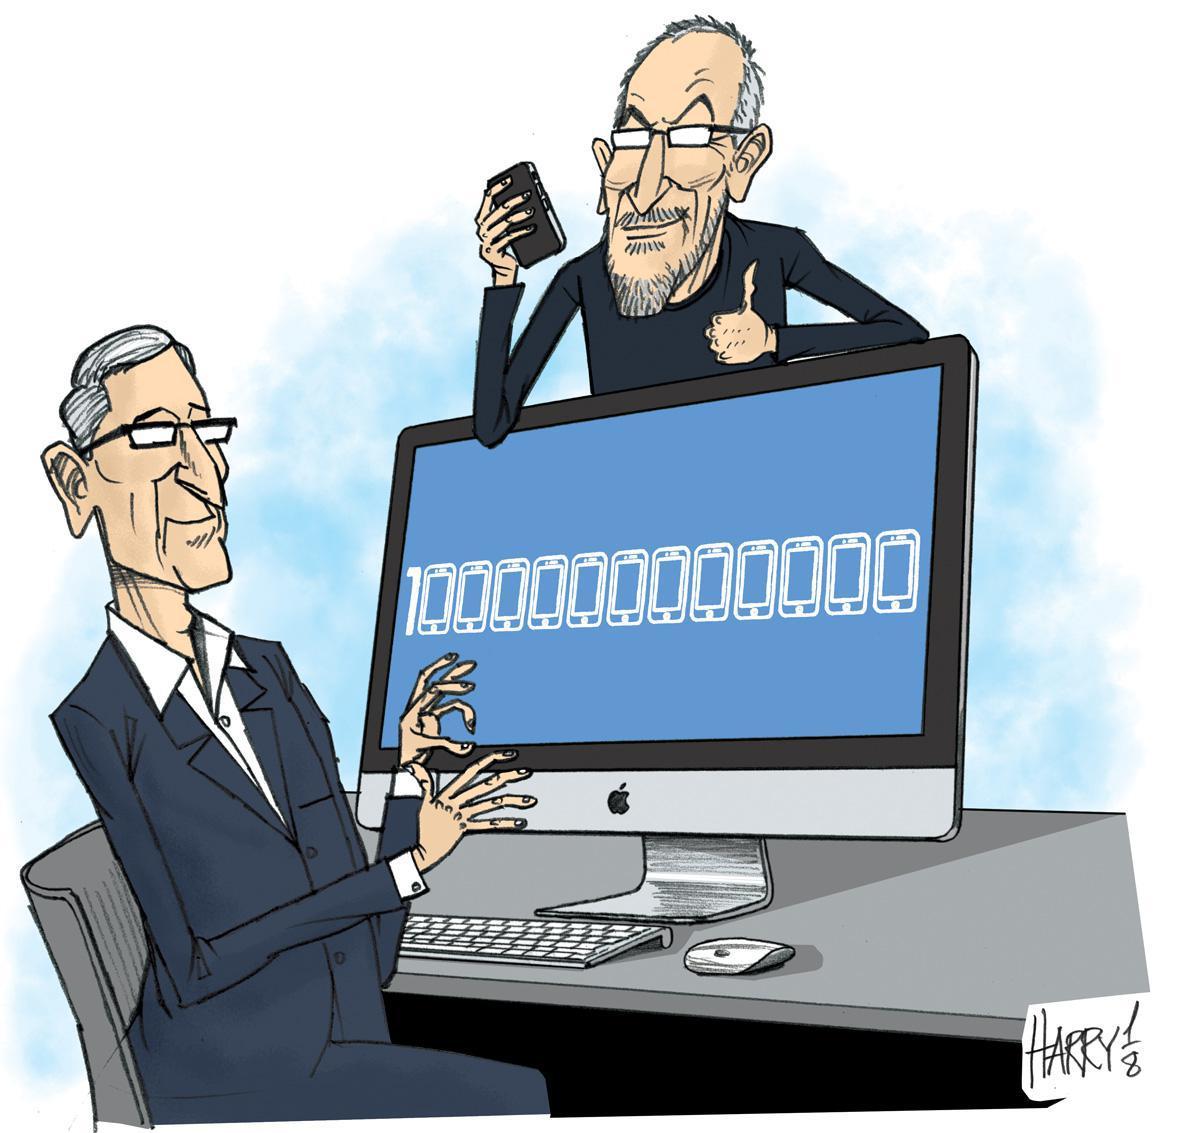 Harry's impression: Apple reaches US$1 trillion in market value